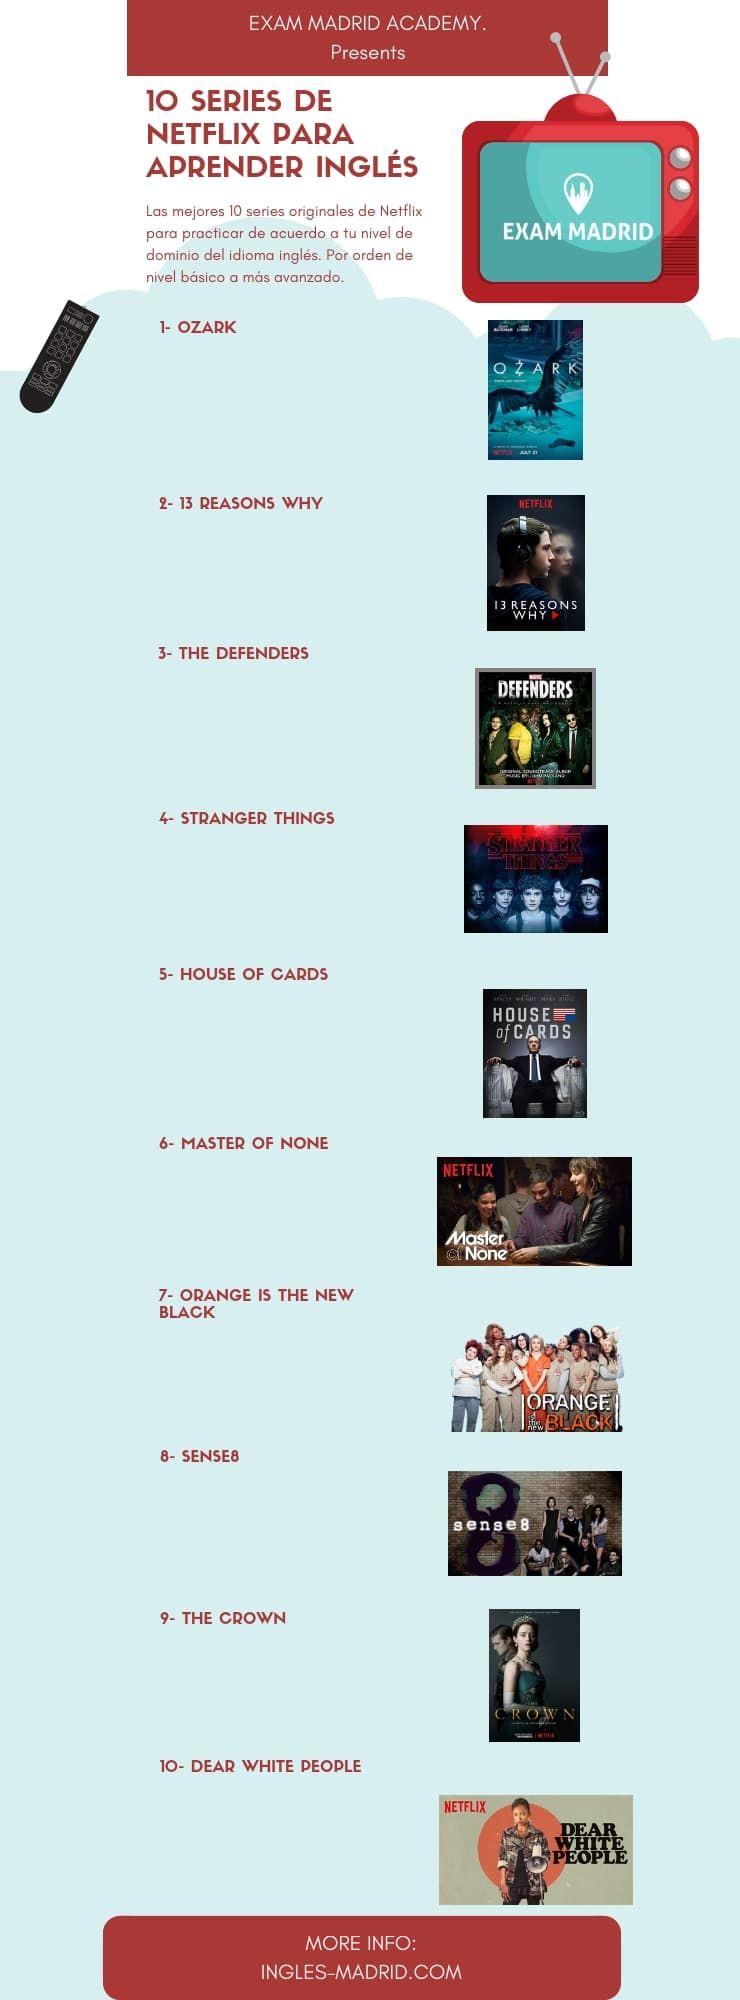 10 Series De Netflix Para Aprender Inglés 10seriesdenetflixaprenderingles 10mejoreseriesdeingle Series Para Aprender Ingles Aprender Inglés Series De Netflix